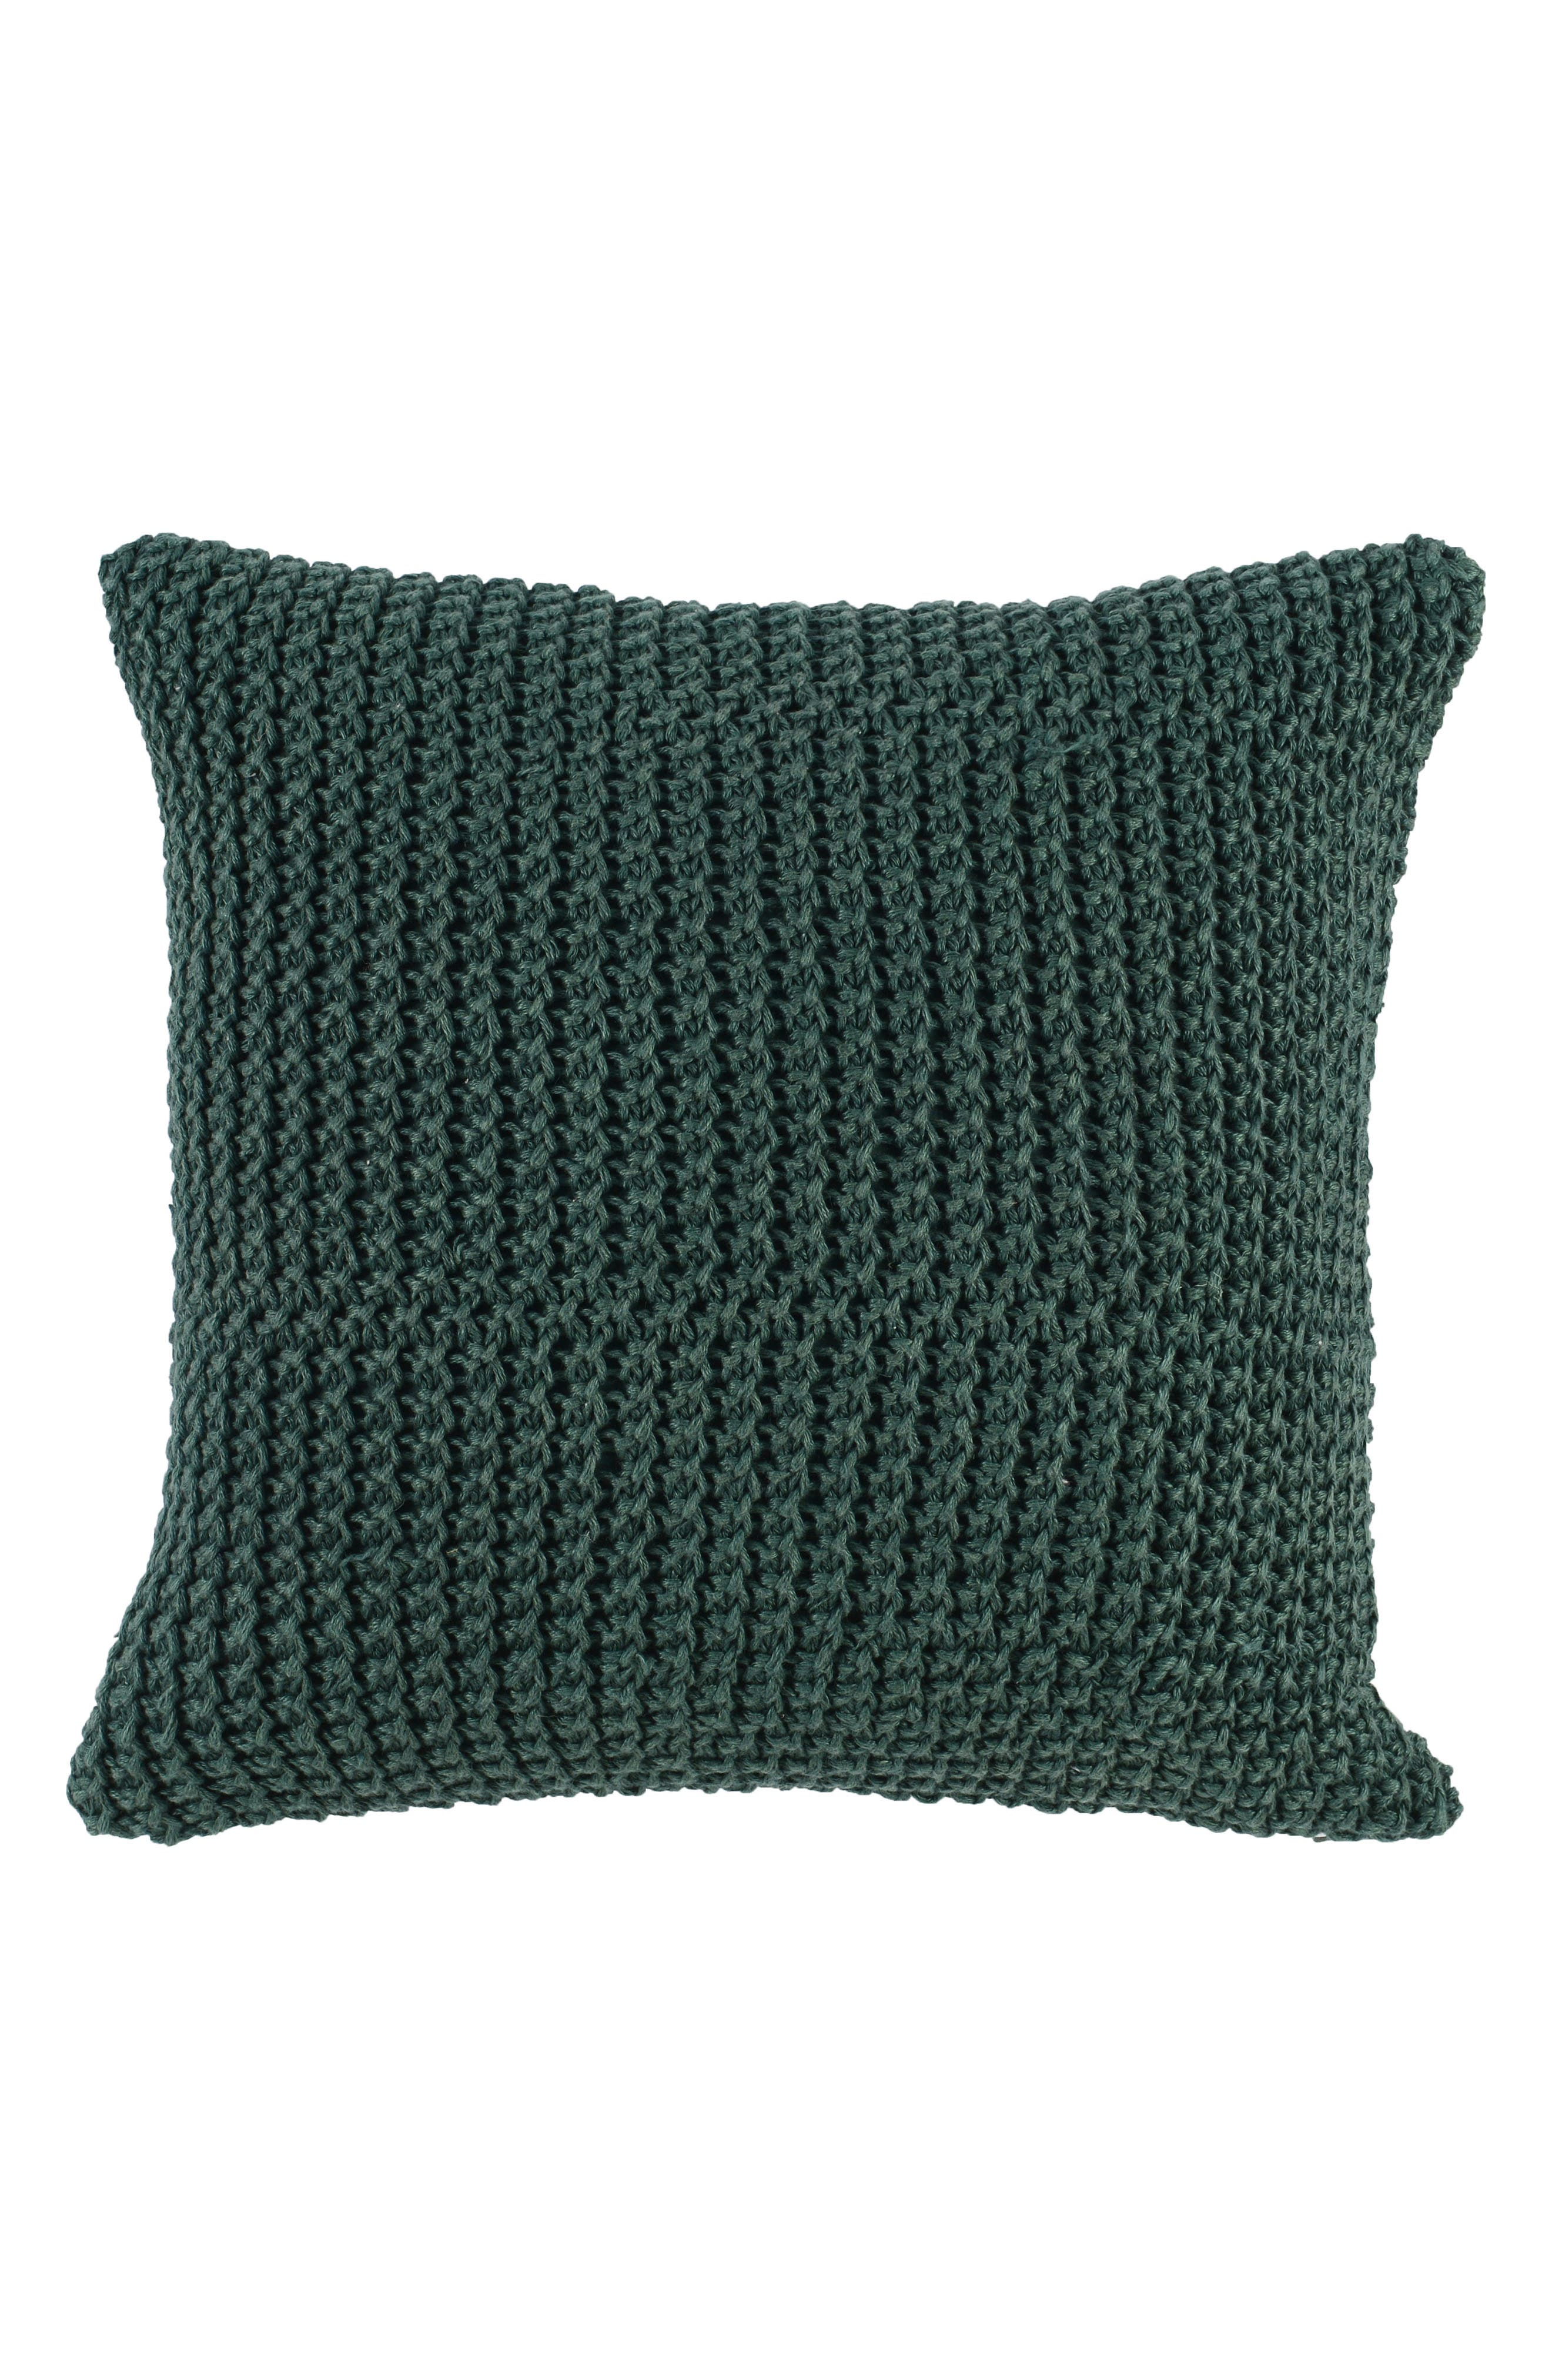 Nita Accent Pillow,                             Main thumbnail 1, color,                             Emerald Green